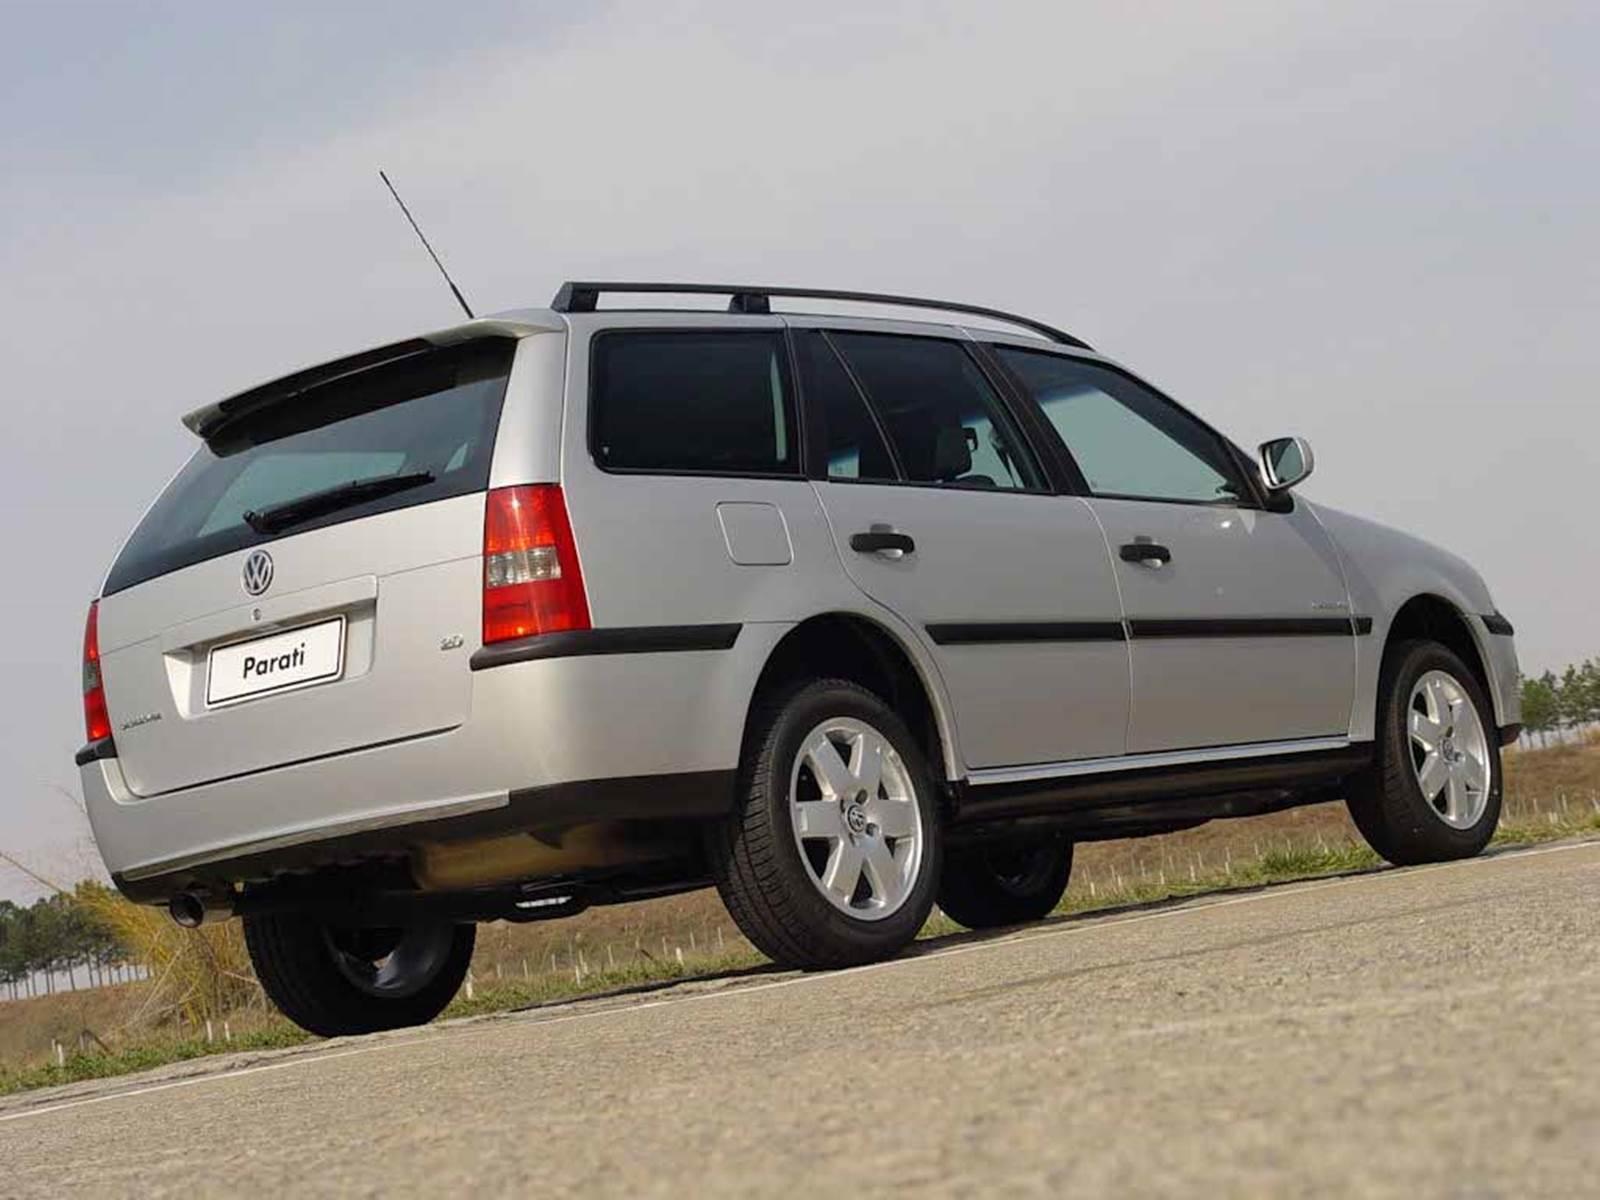 VW Parati 2002 Crossover 5